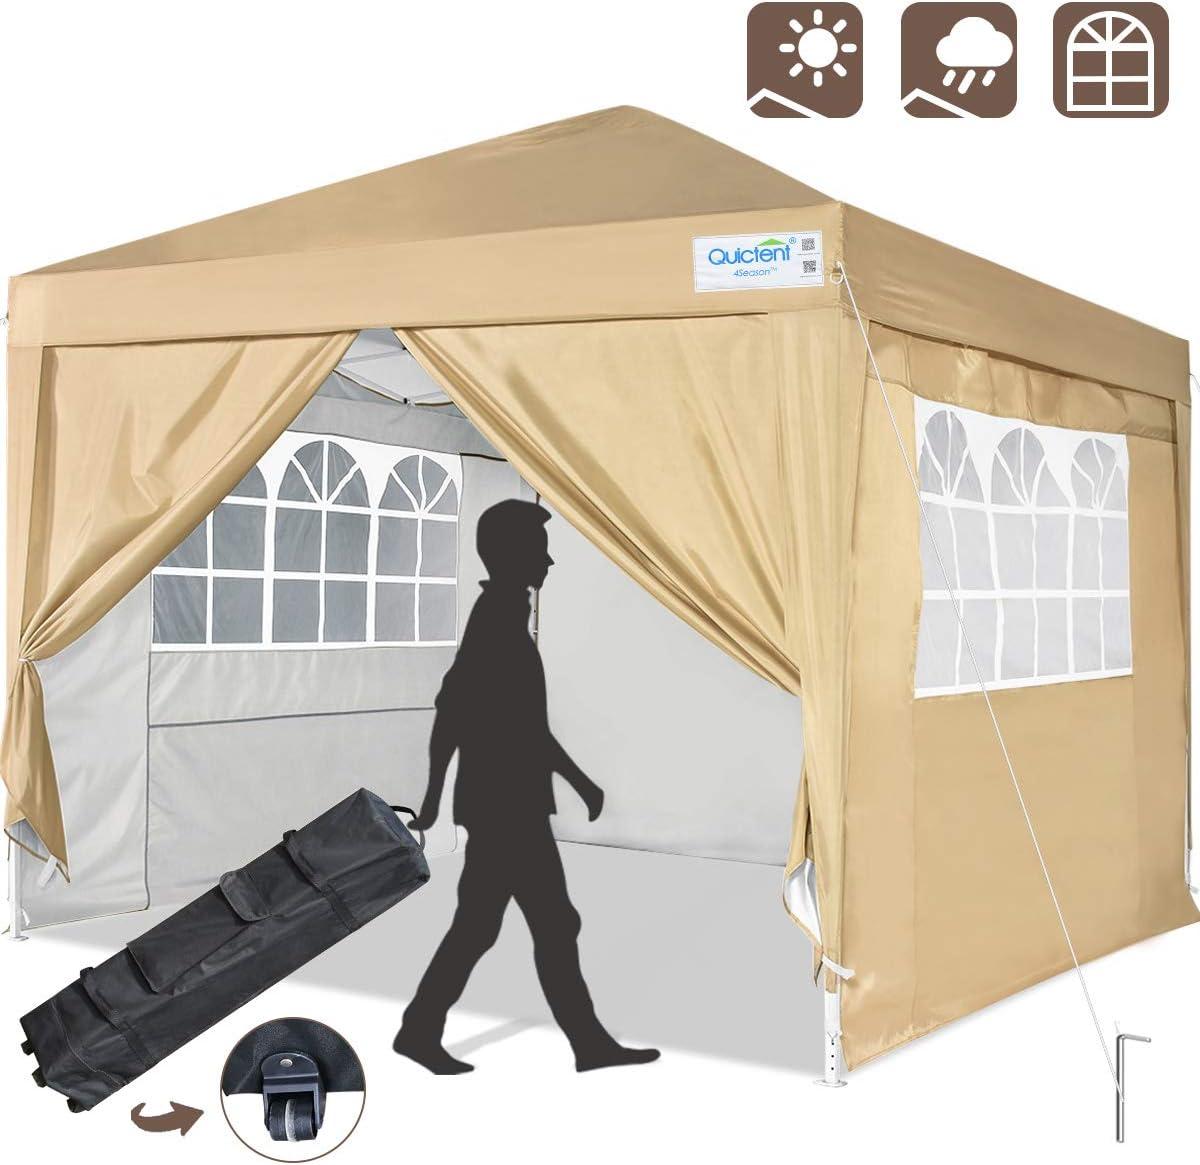 Quictent Silvox 10×10 Ez Pop Up Canopy Tent Instant Canopy Shelter Protable Gazebo Waterproof